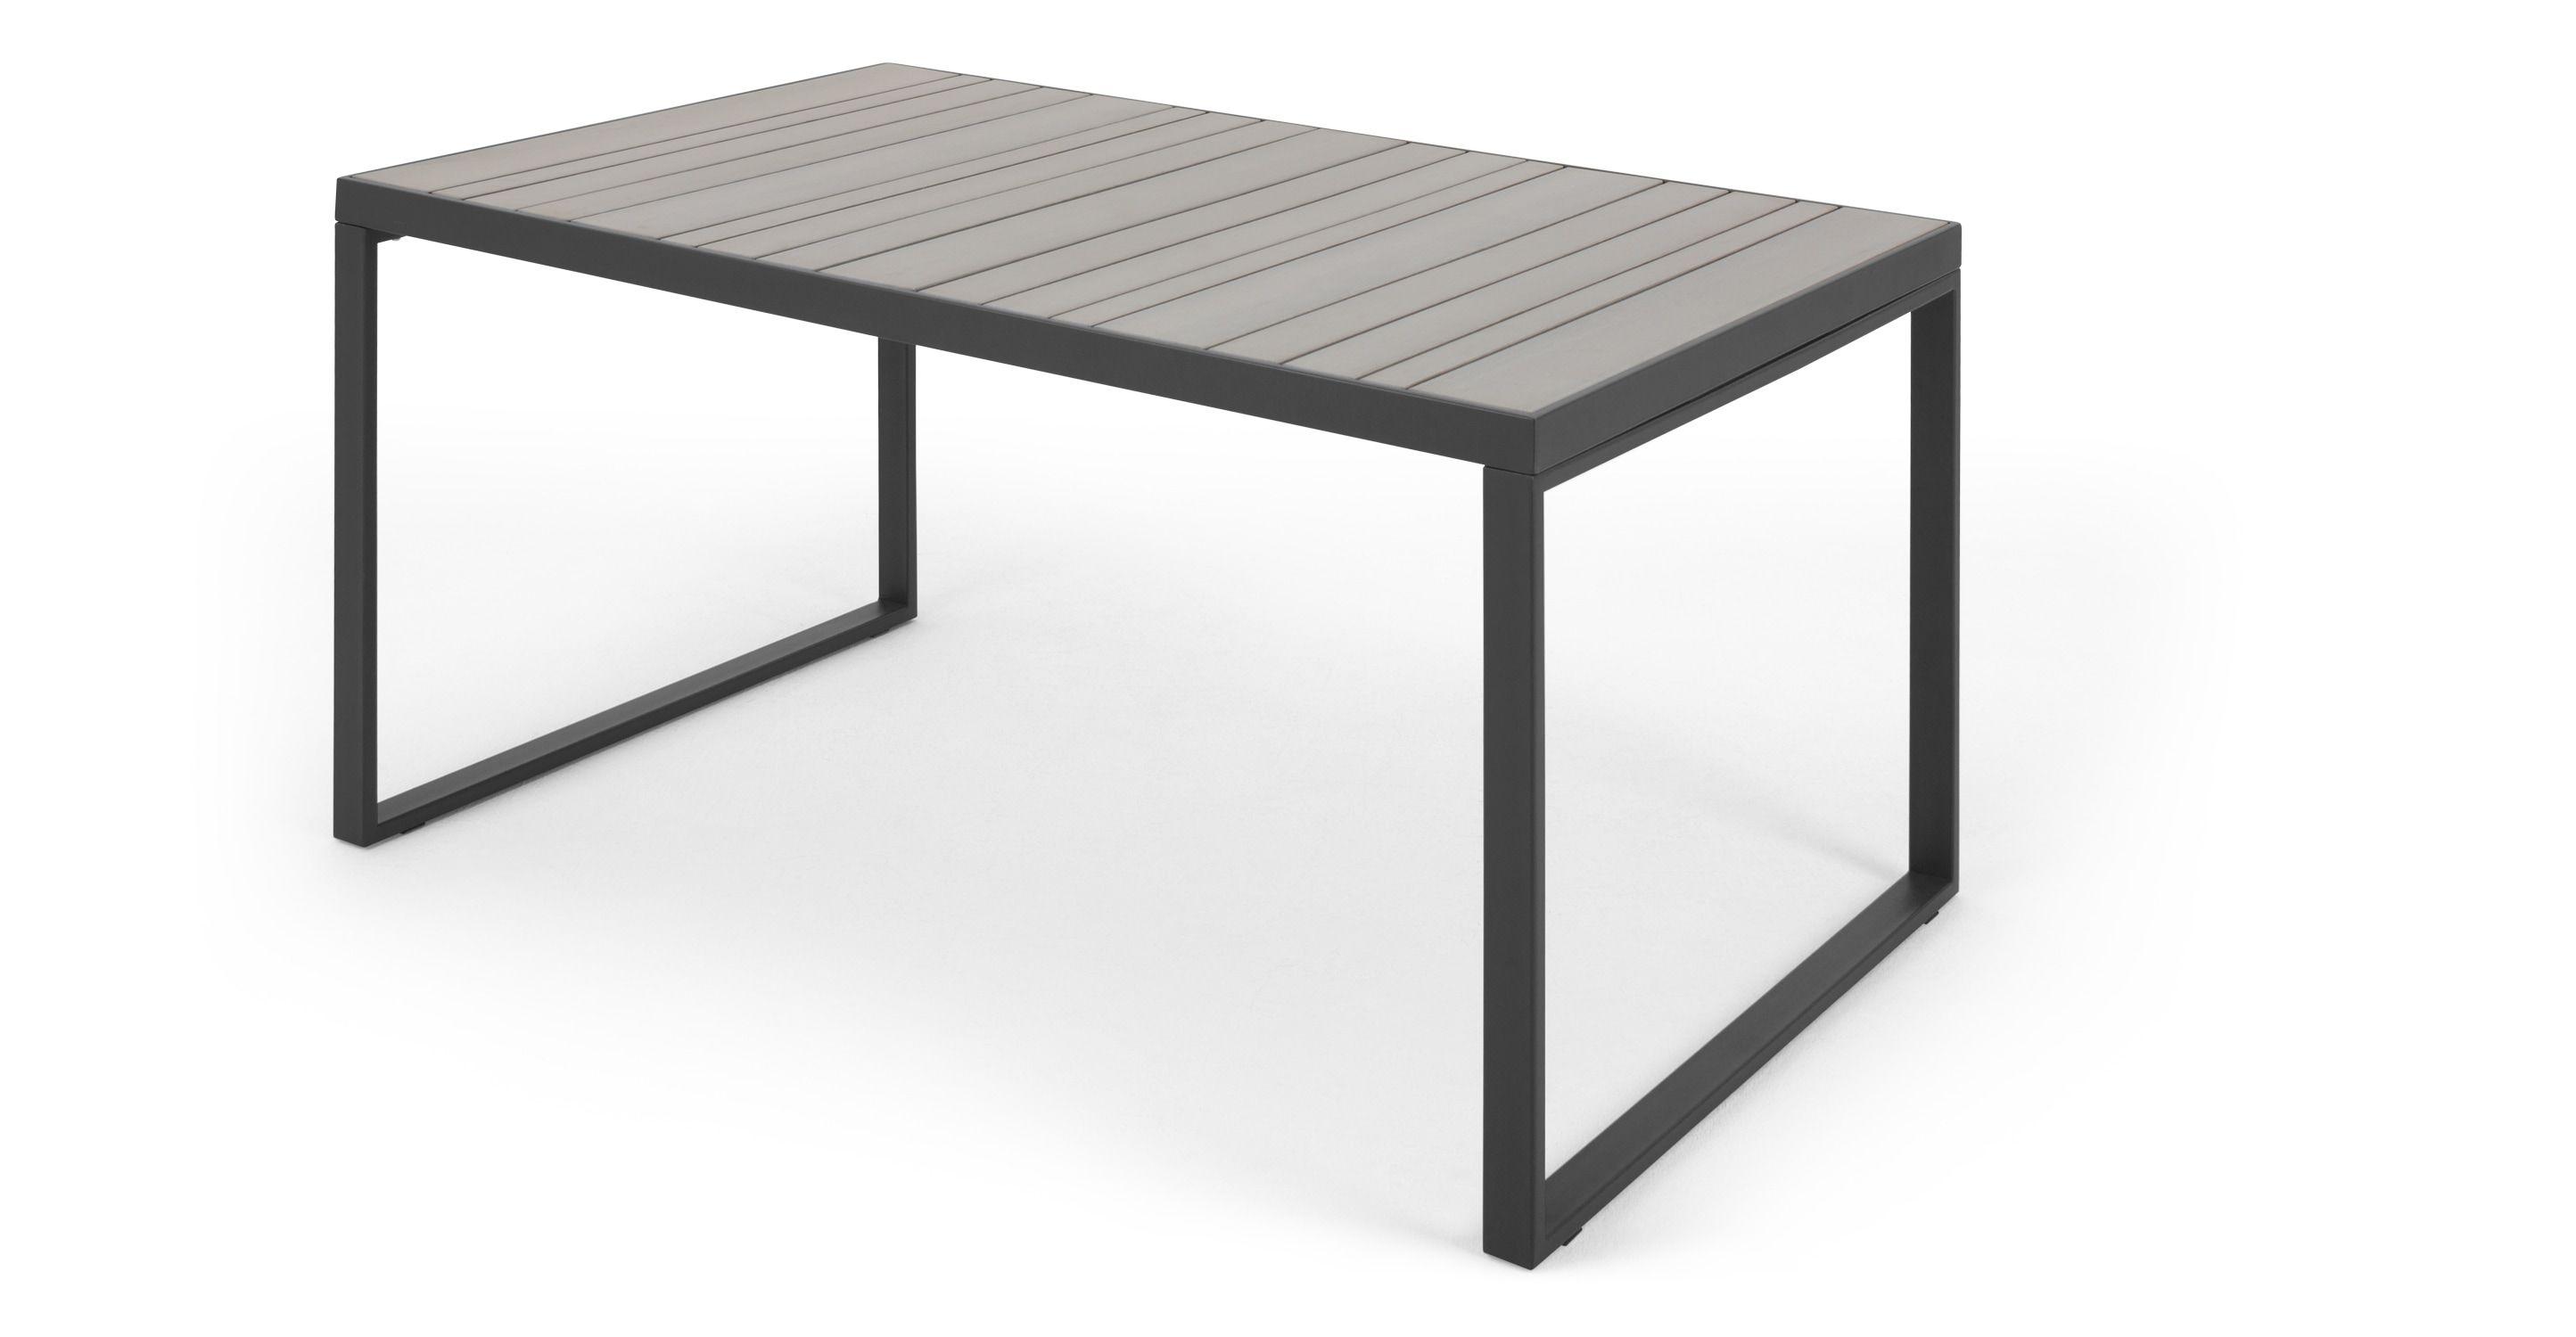 Catania Gartentisch (147 cm), Grau - MADE.com Jetzt bestellen unter ...